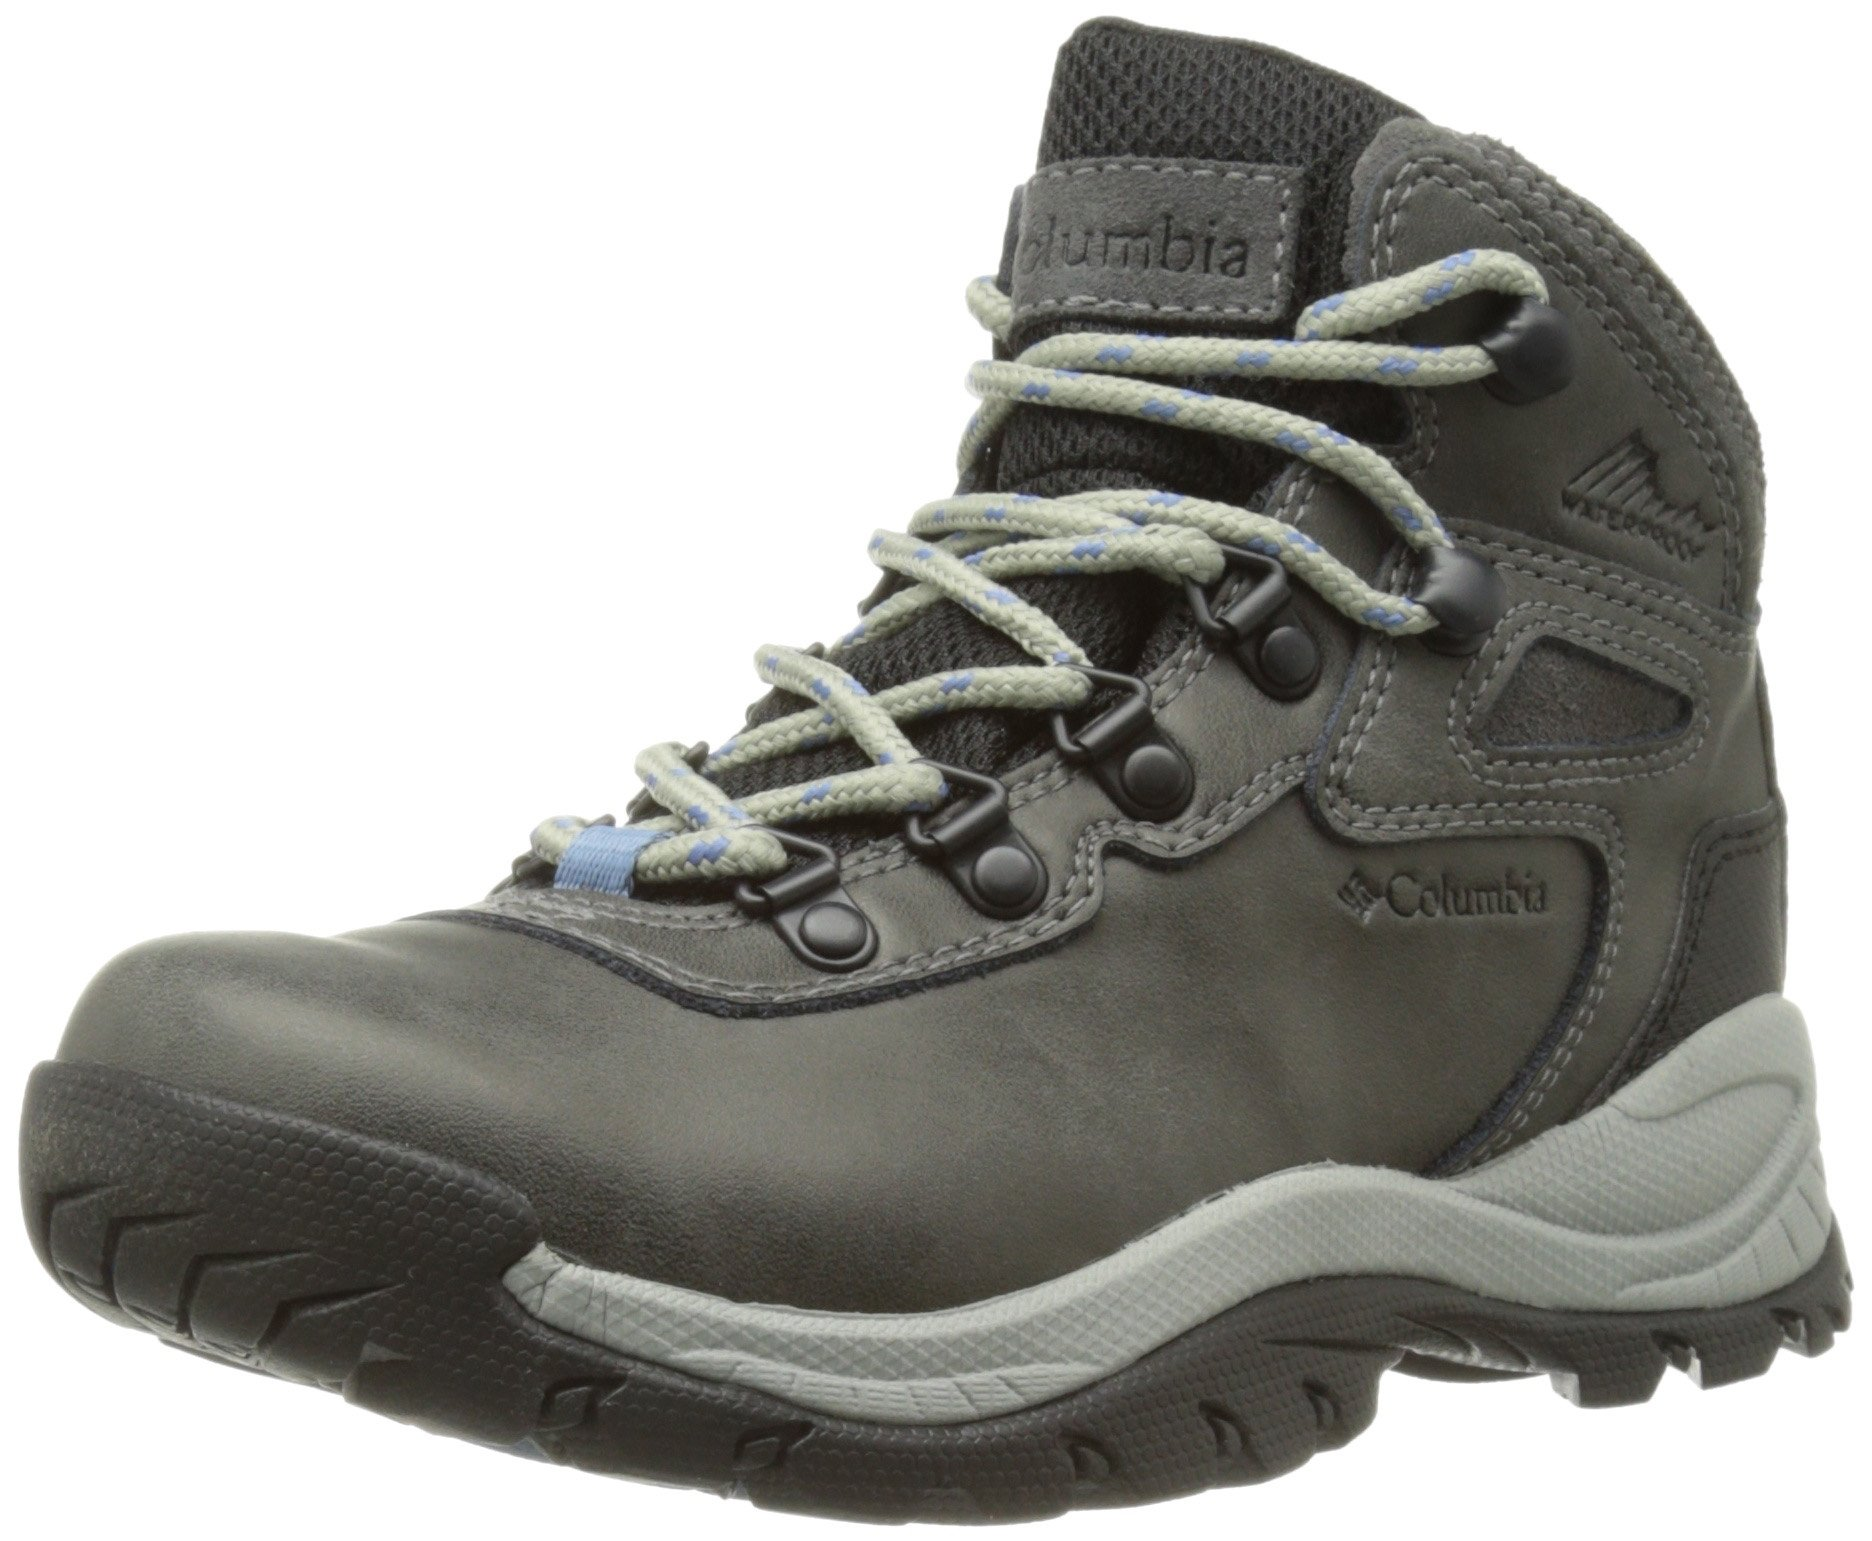 Columbia Women's Newton Ridge Plus Hiking Boot,Quarry/Cool Wave,12 M US